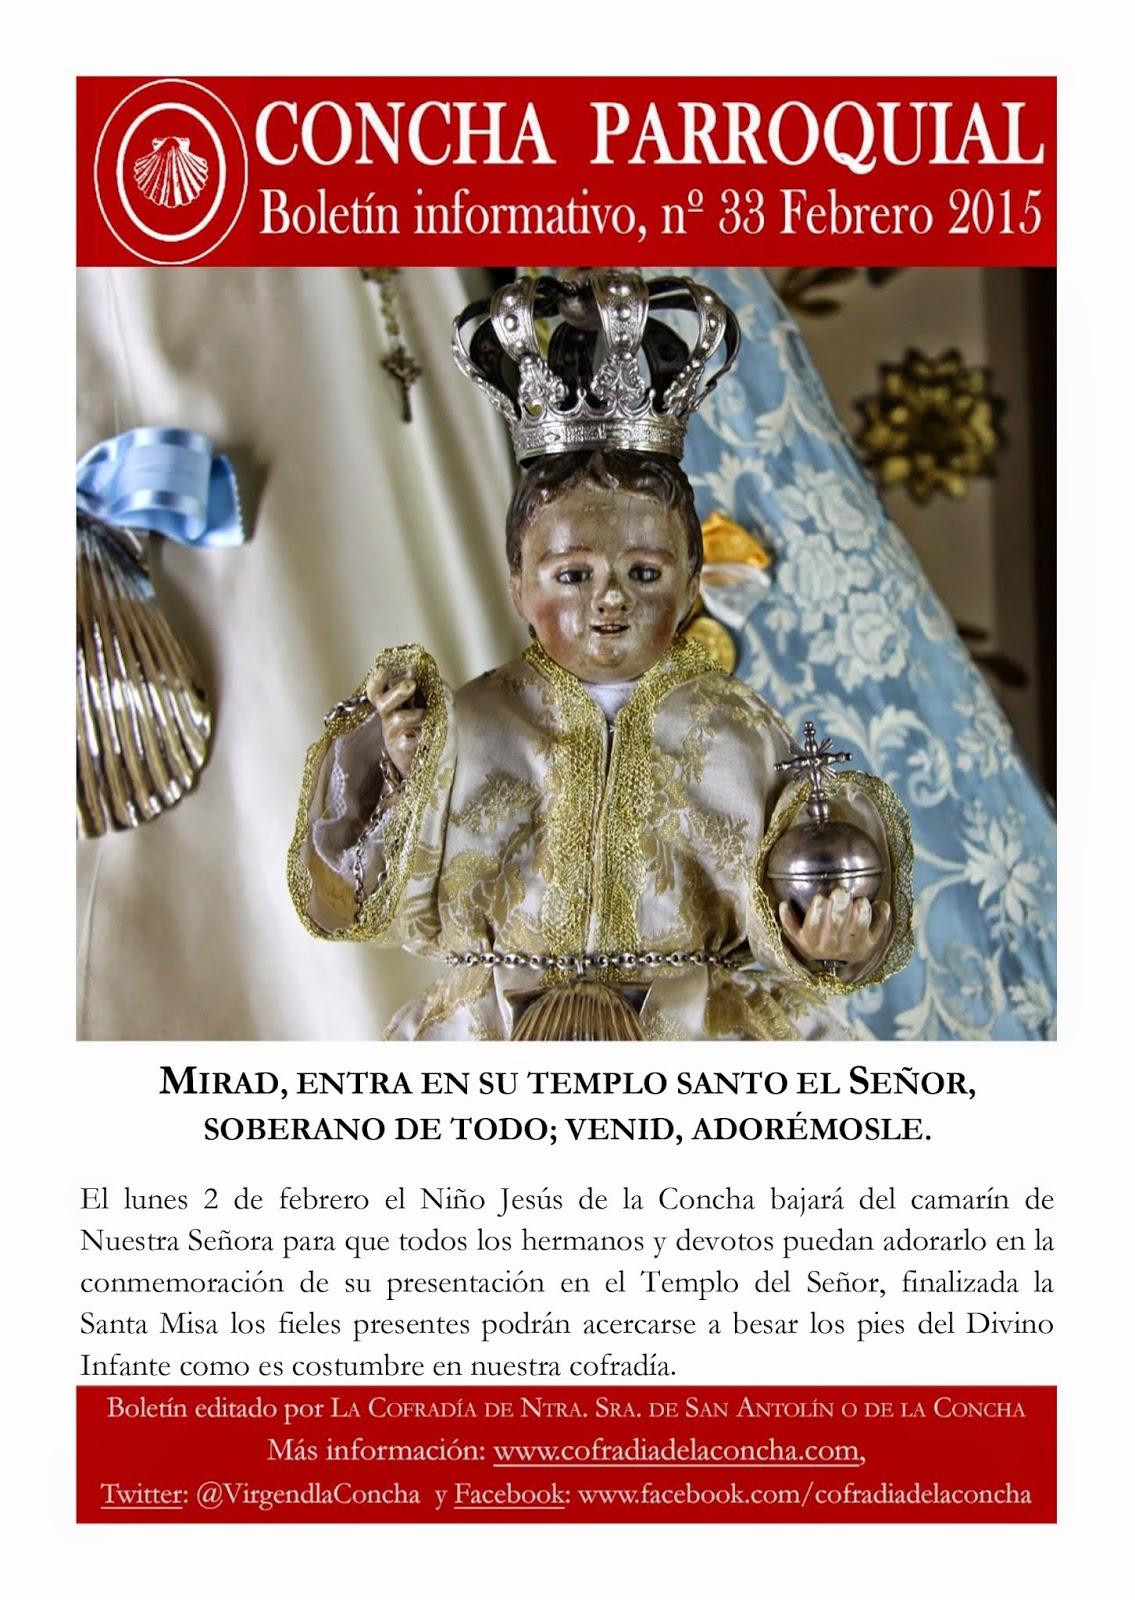 http://www.cofradiadelaconcha.com/boletines/2015/Febrero2015.pdf